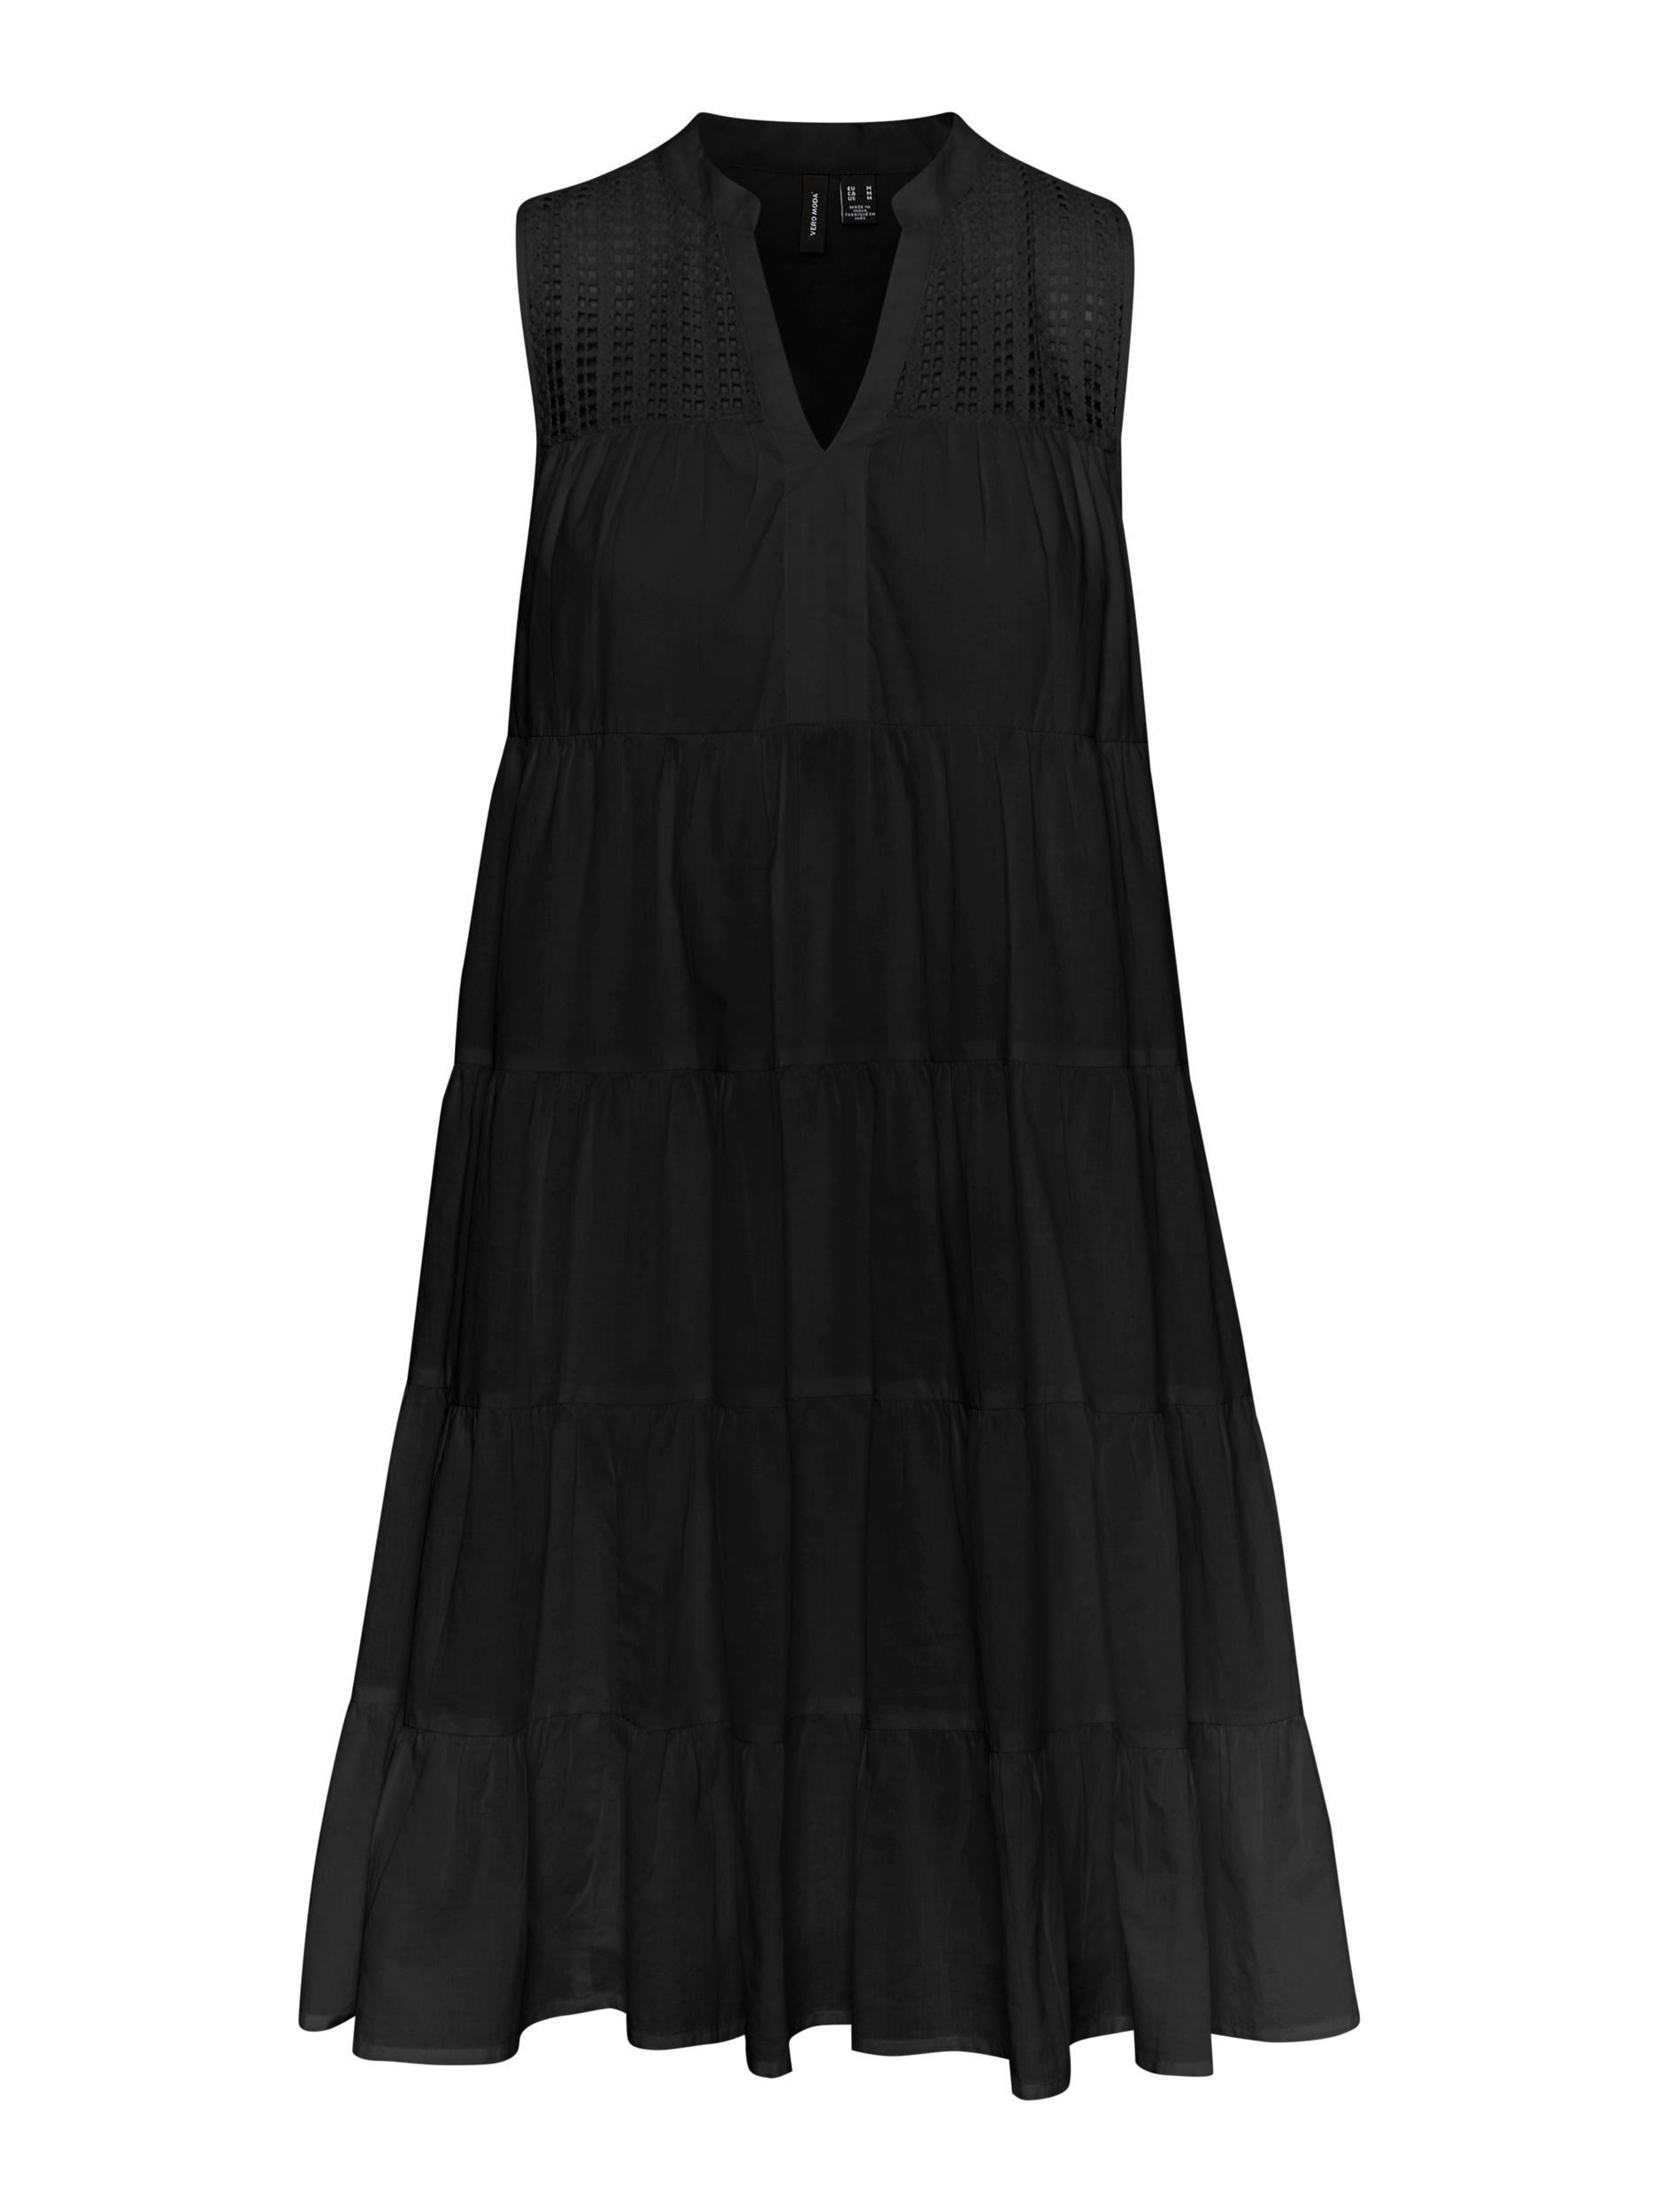 Vero Moda Loretta kjole, sort, medium